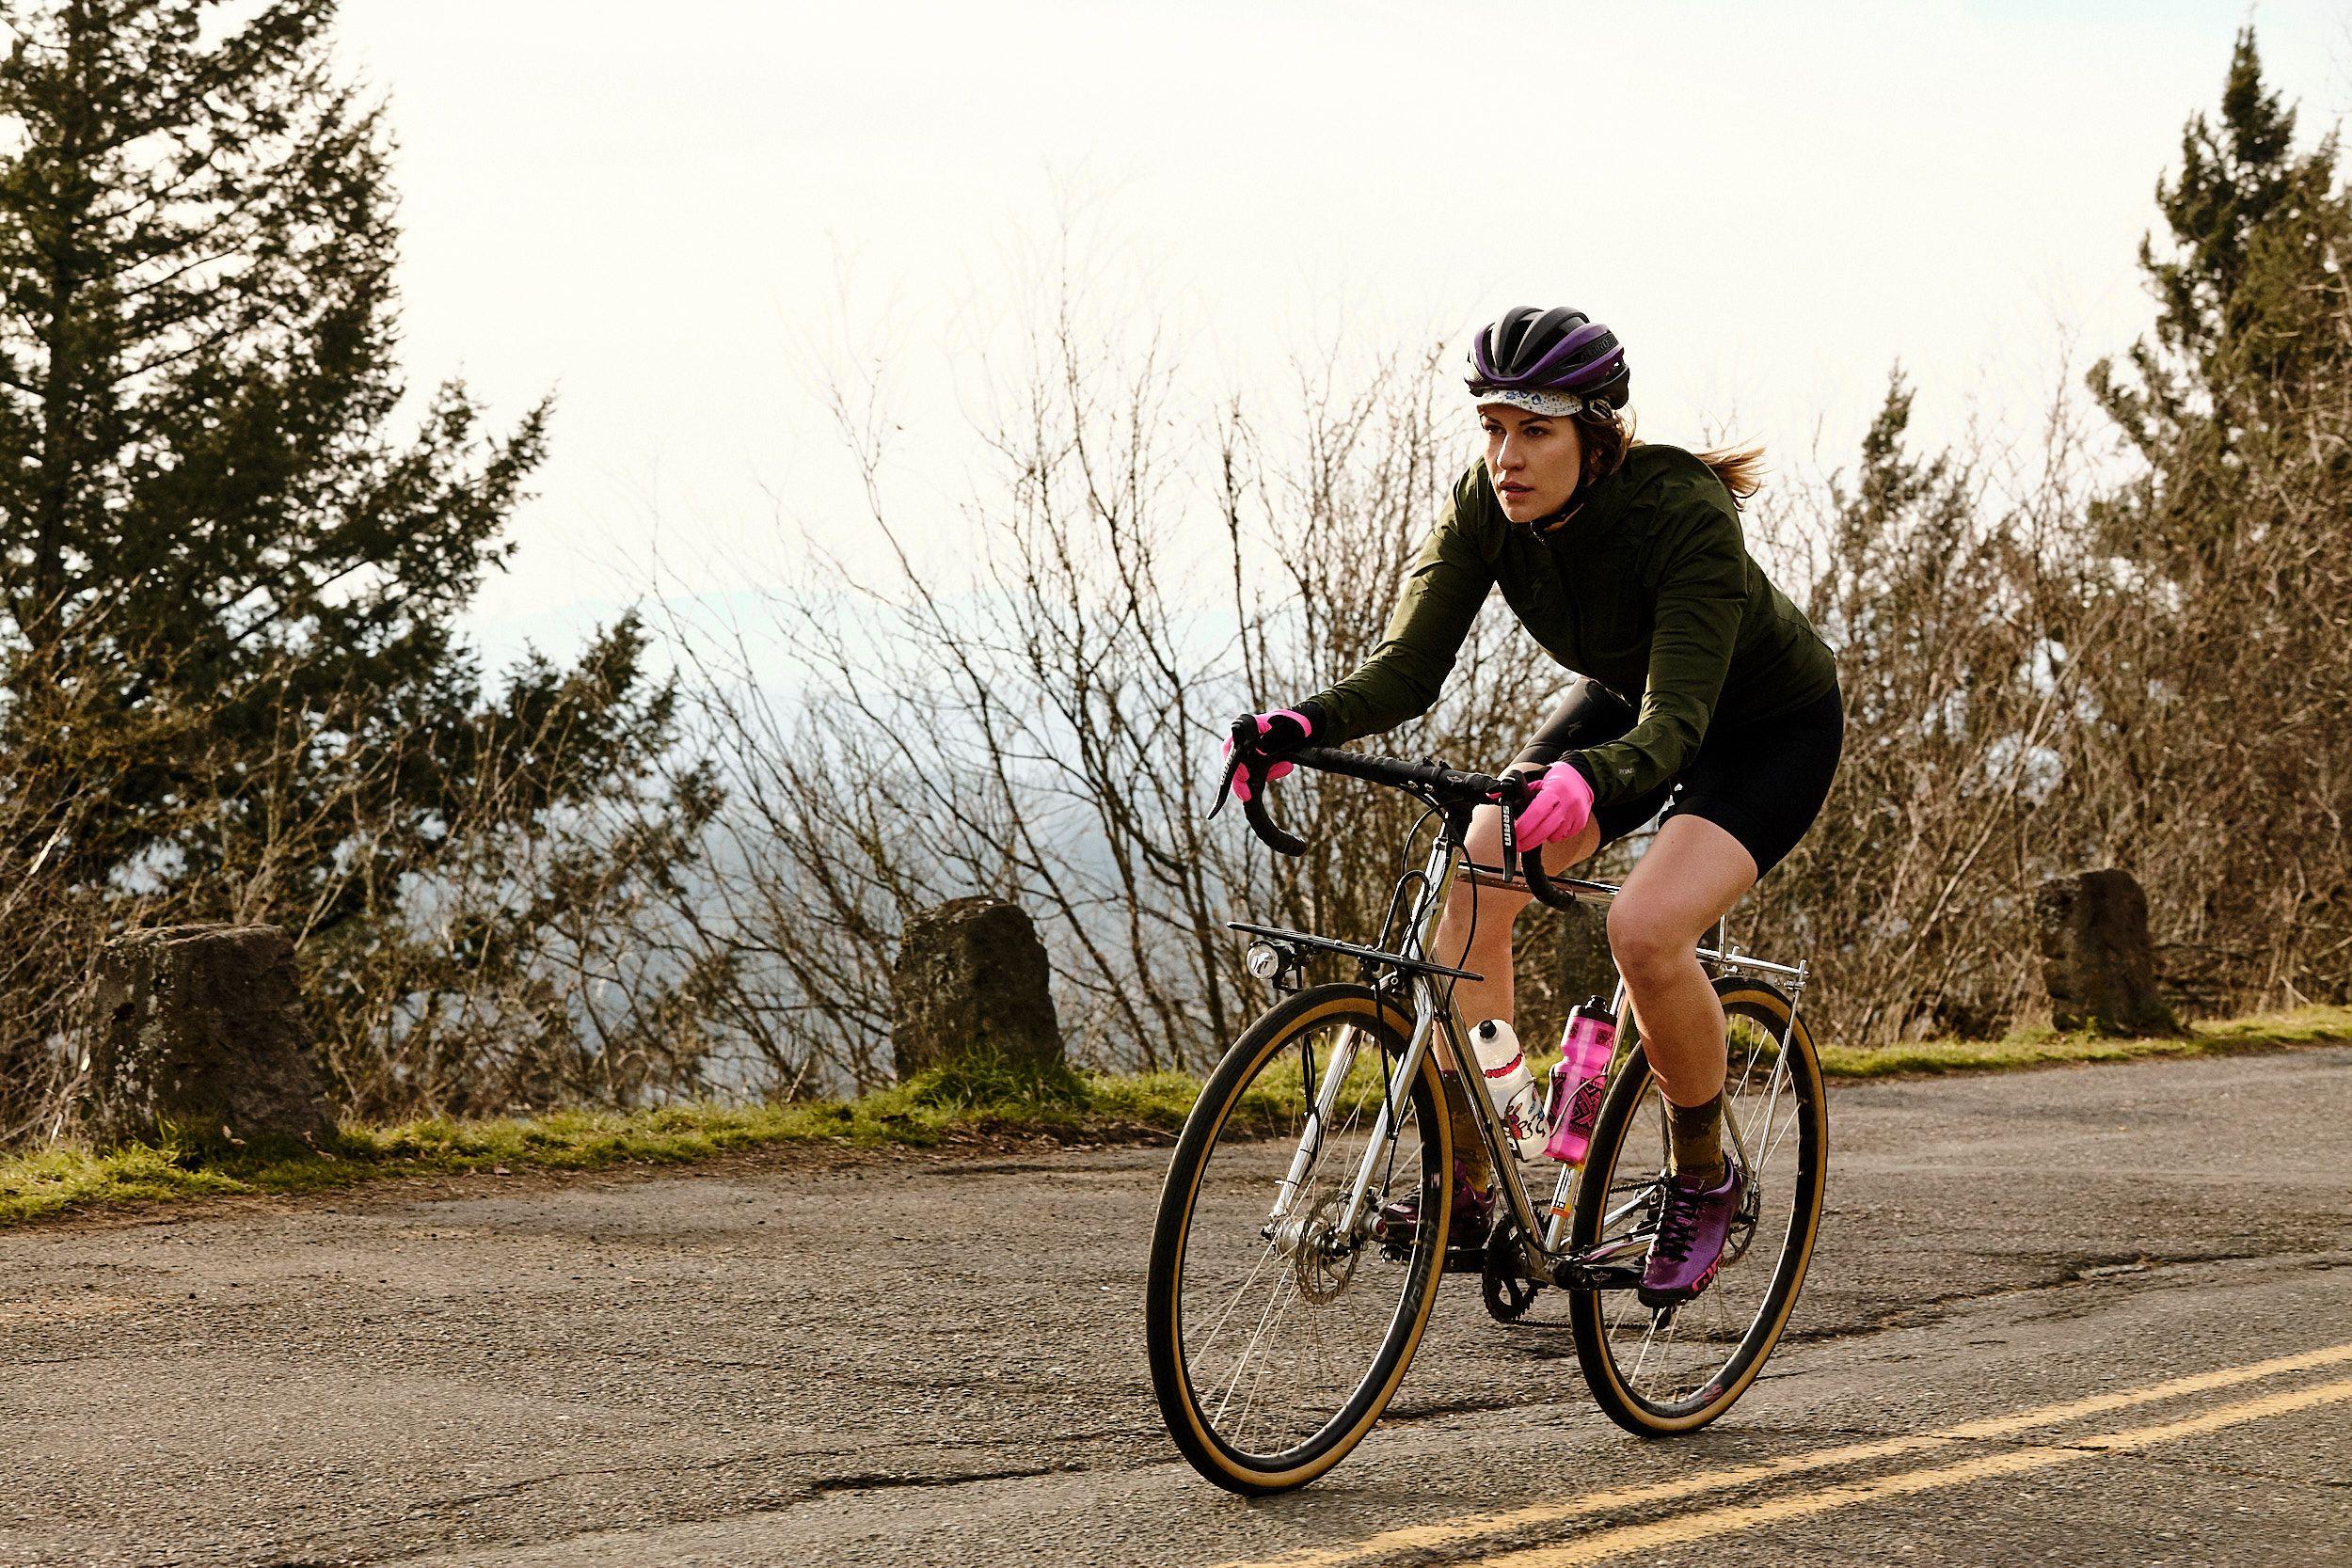 Cycling Training Plan 6 Week Plan For Beginner Cyclists